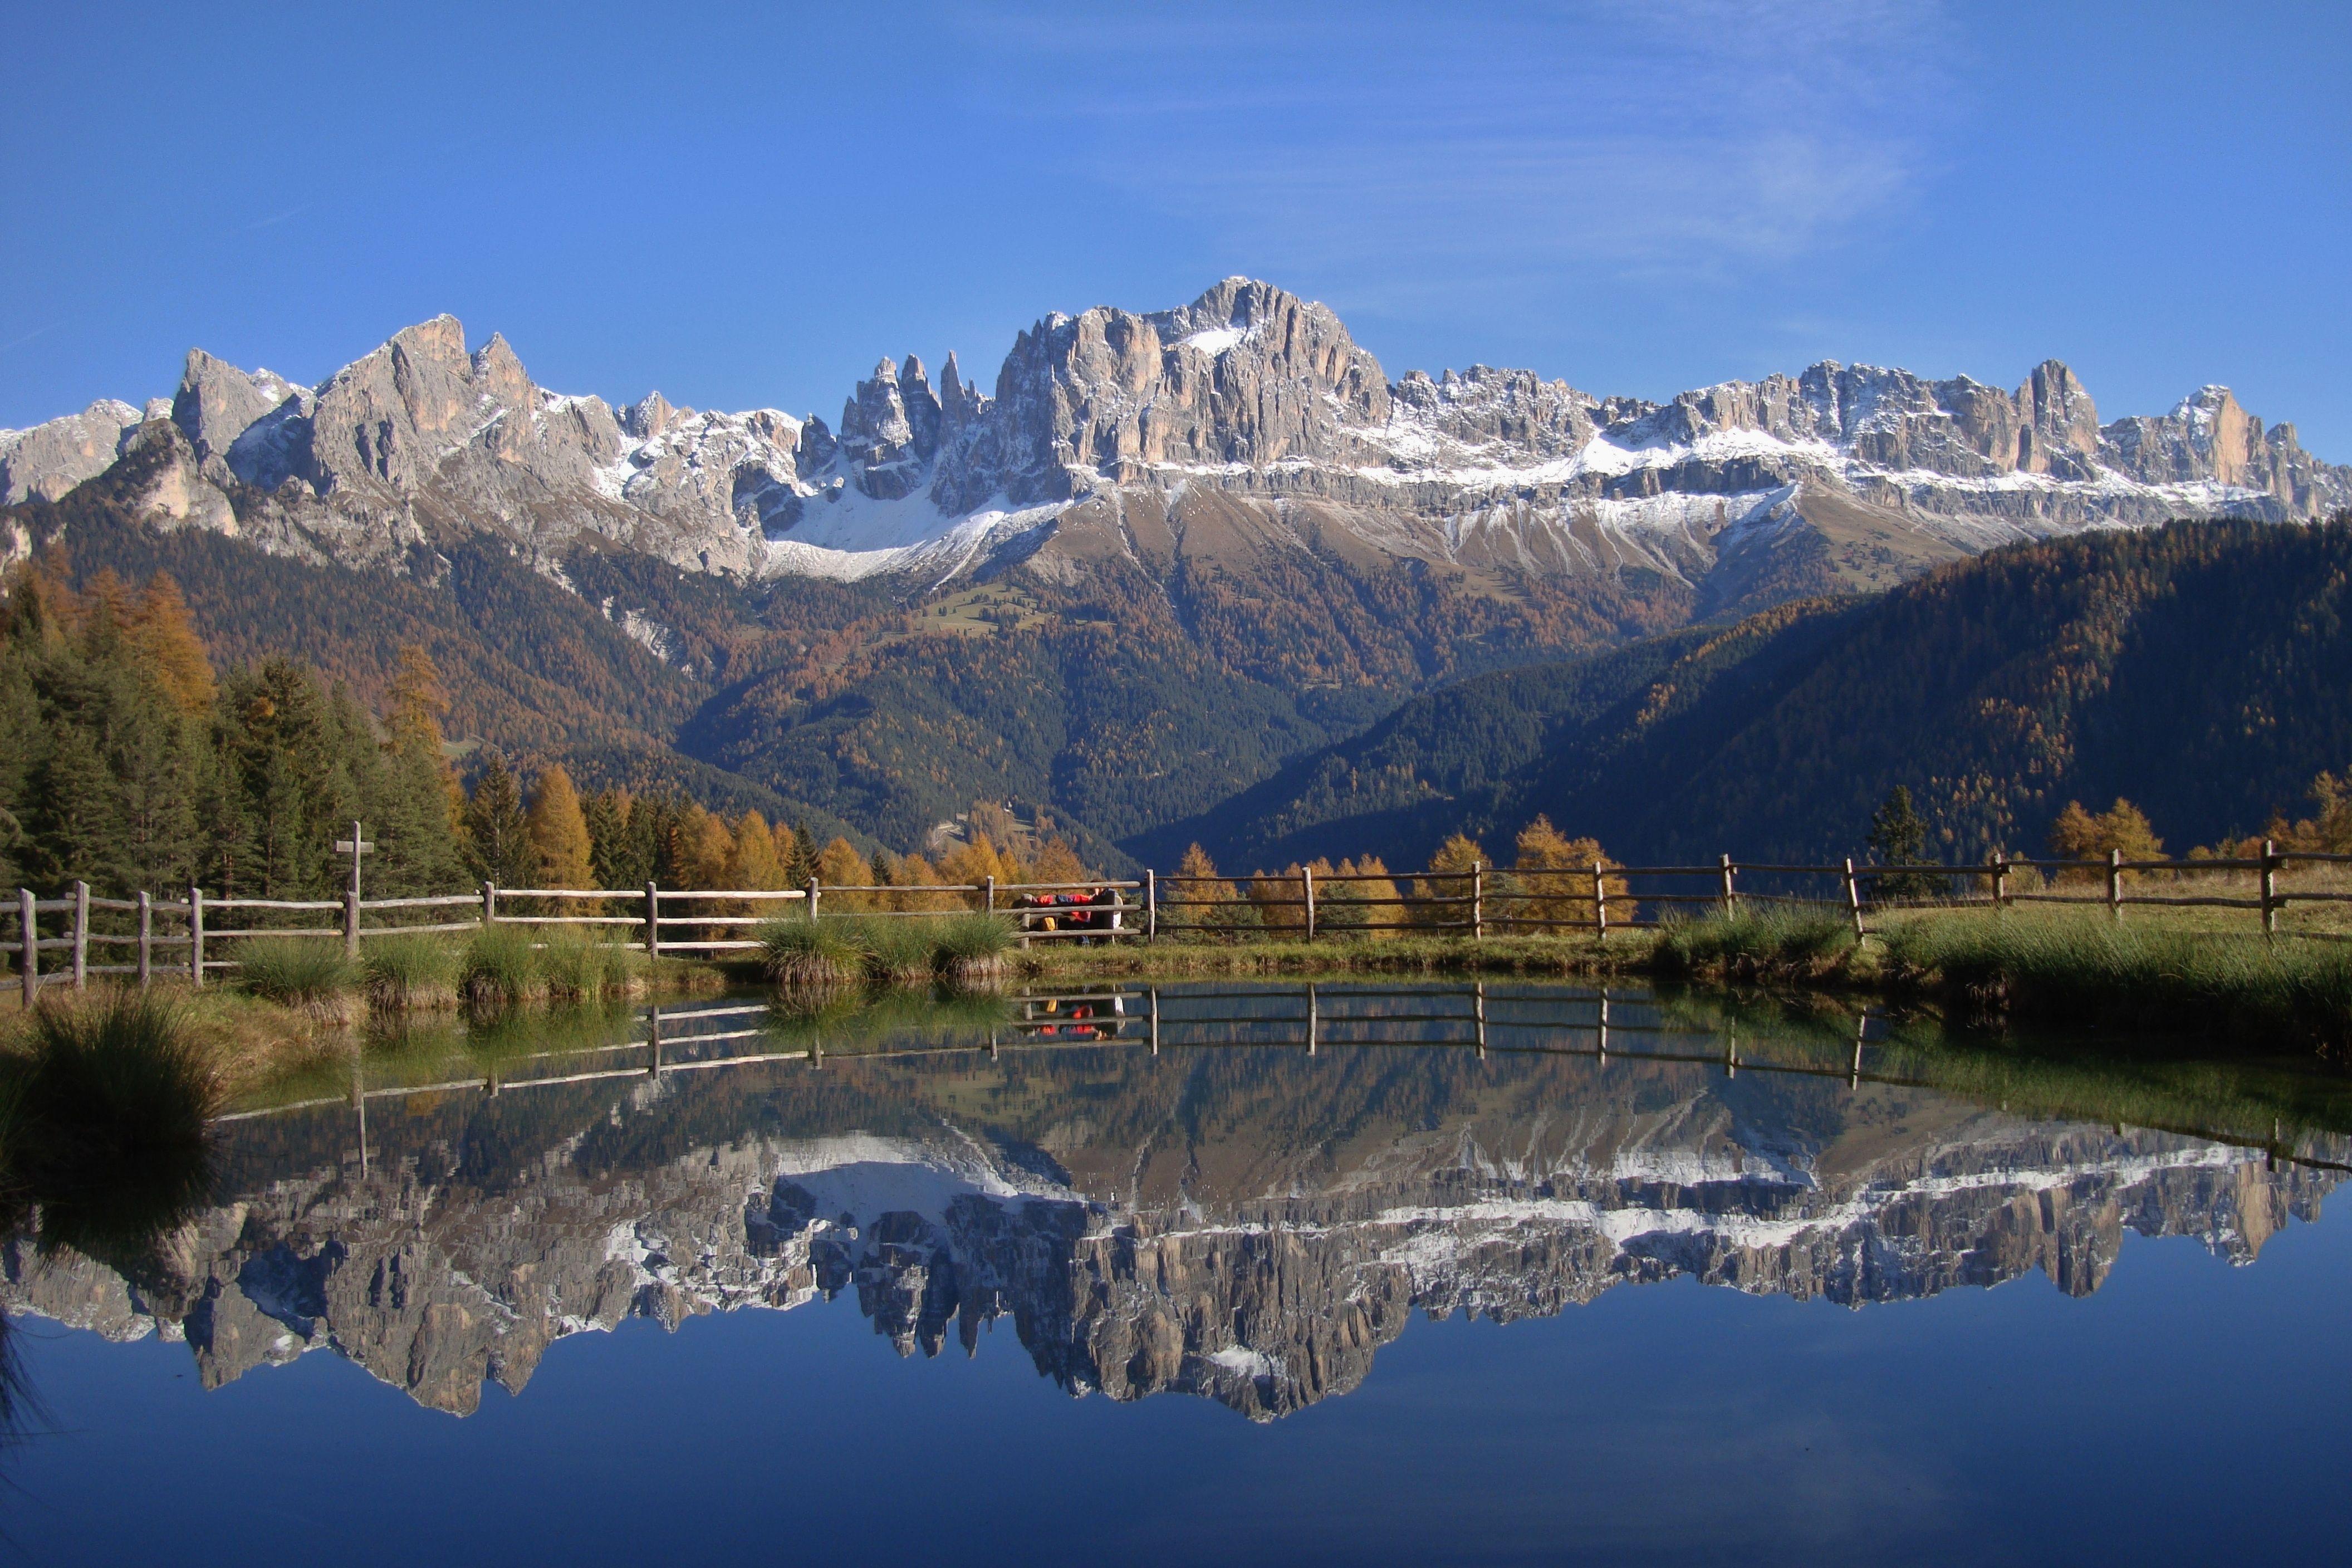 Thumbnail for Sydtyrols håb om en genforening